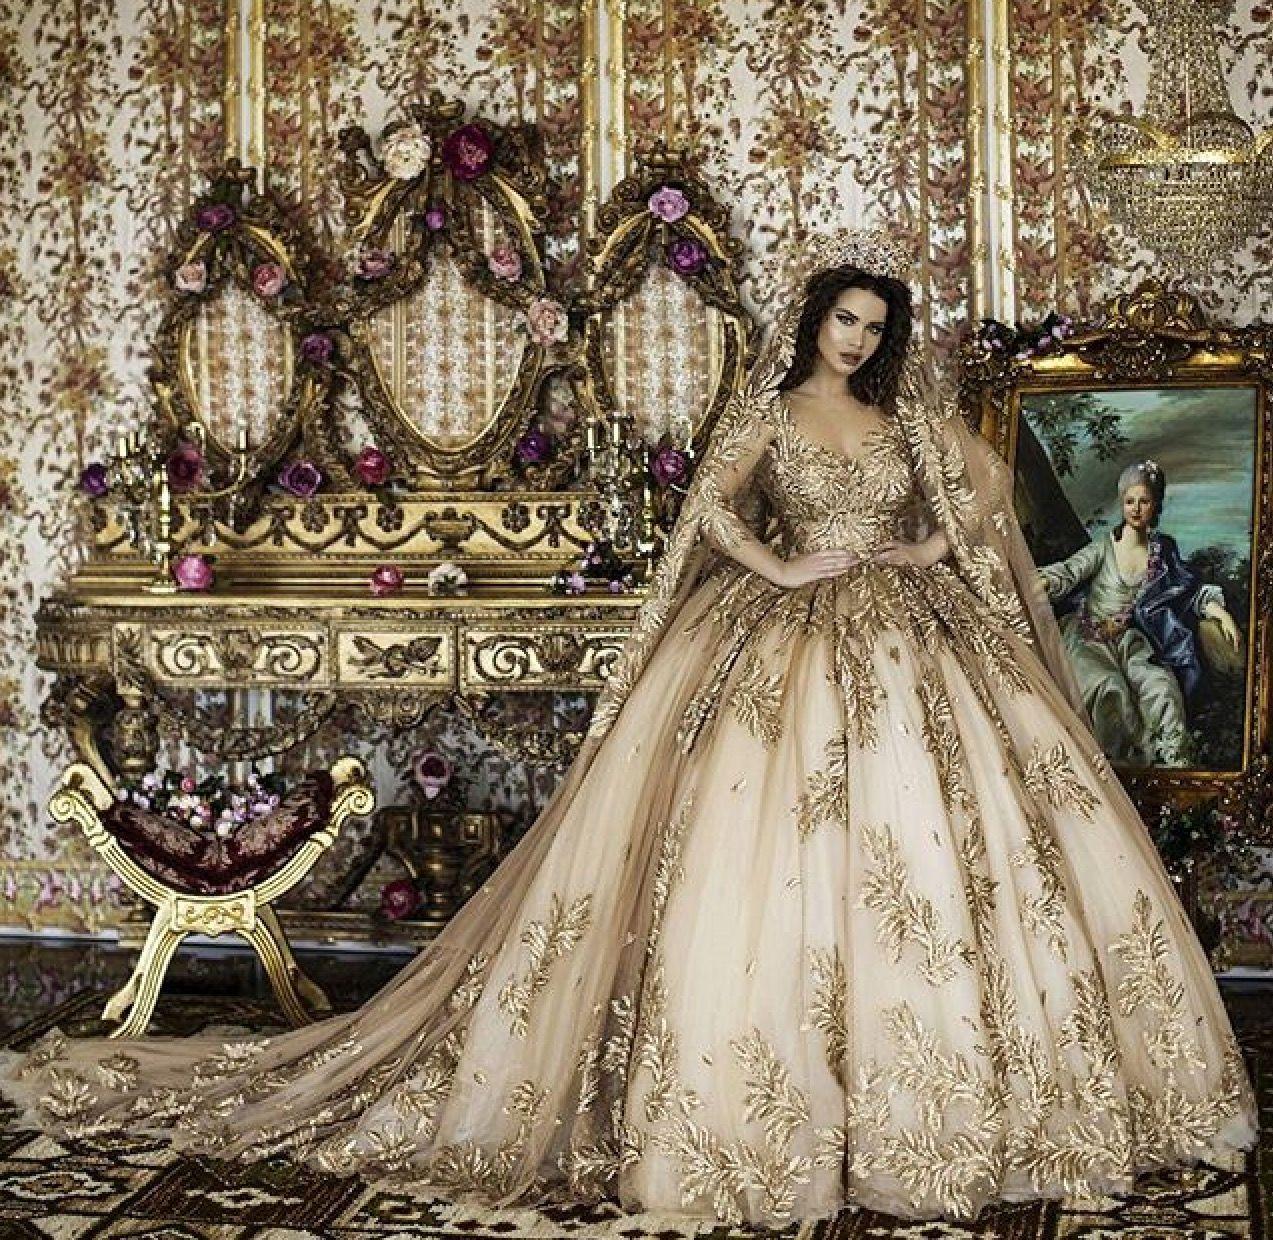 Pin by Ashleigh Wildman on dresses | Pinterest | Wedding dress ...